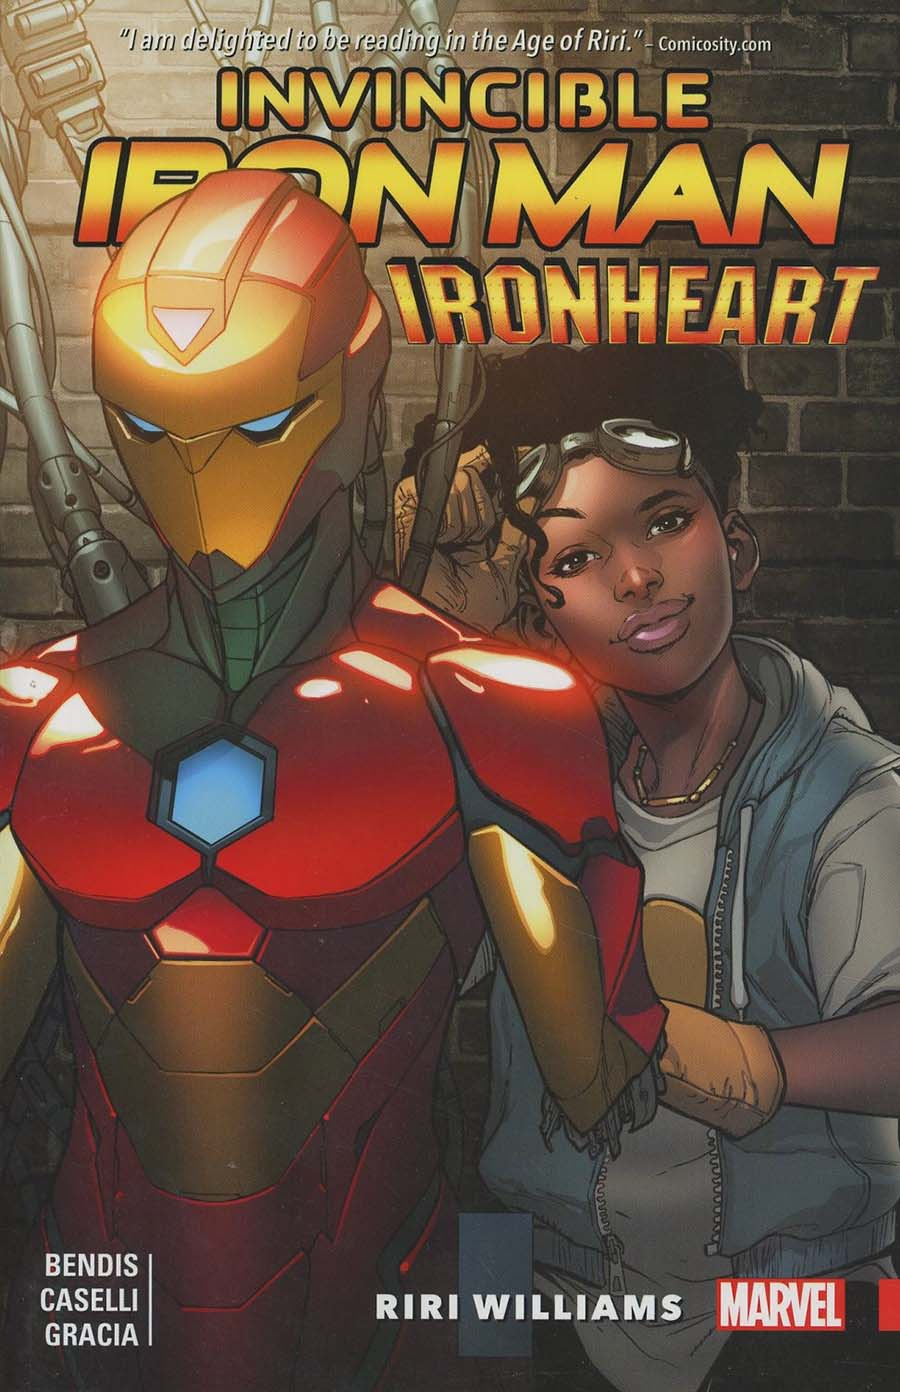 Invincible Iron Man Ironheart Vol 1 Riri Williams TP